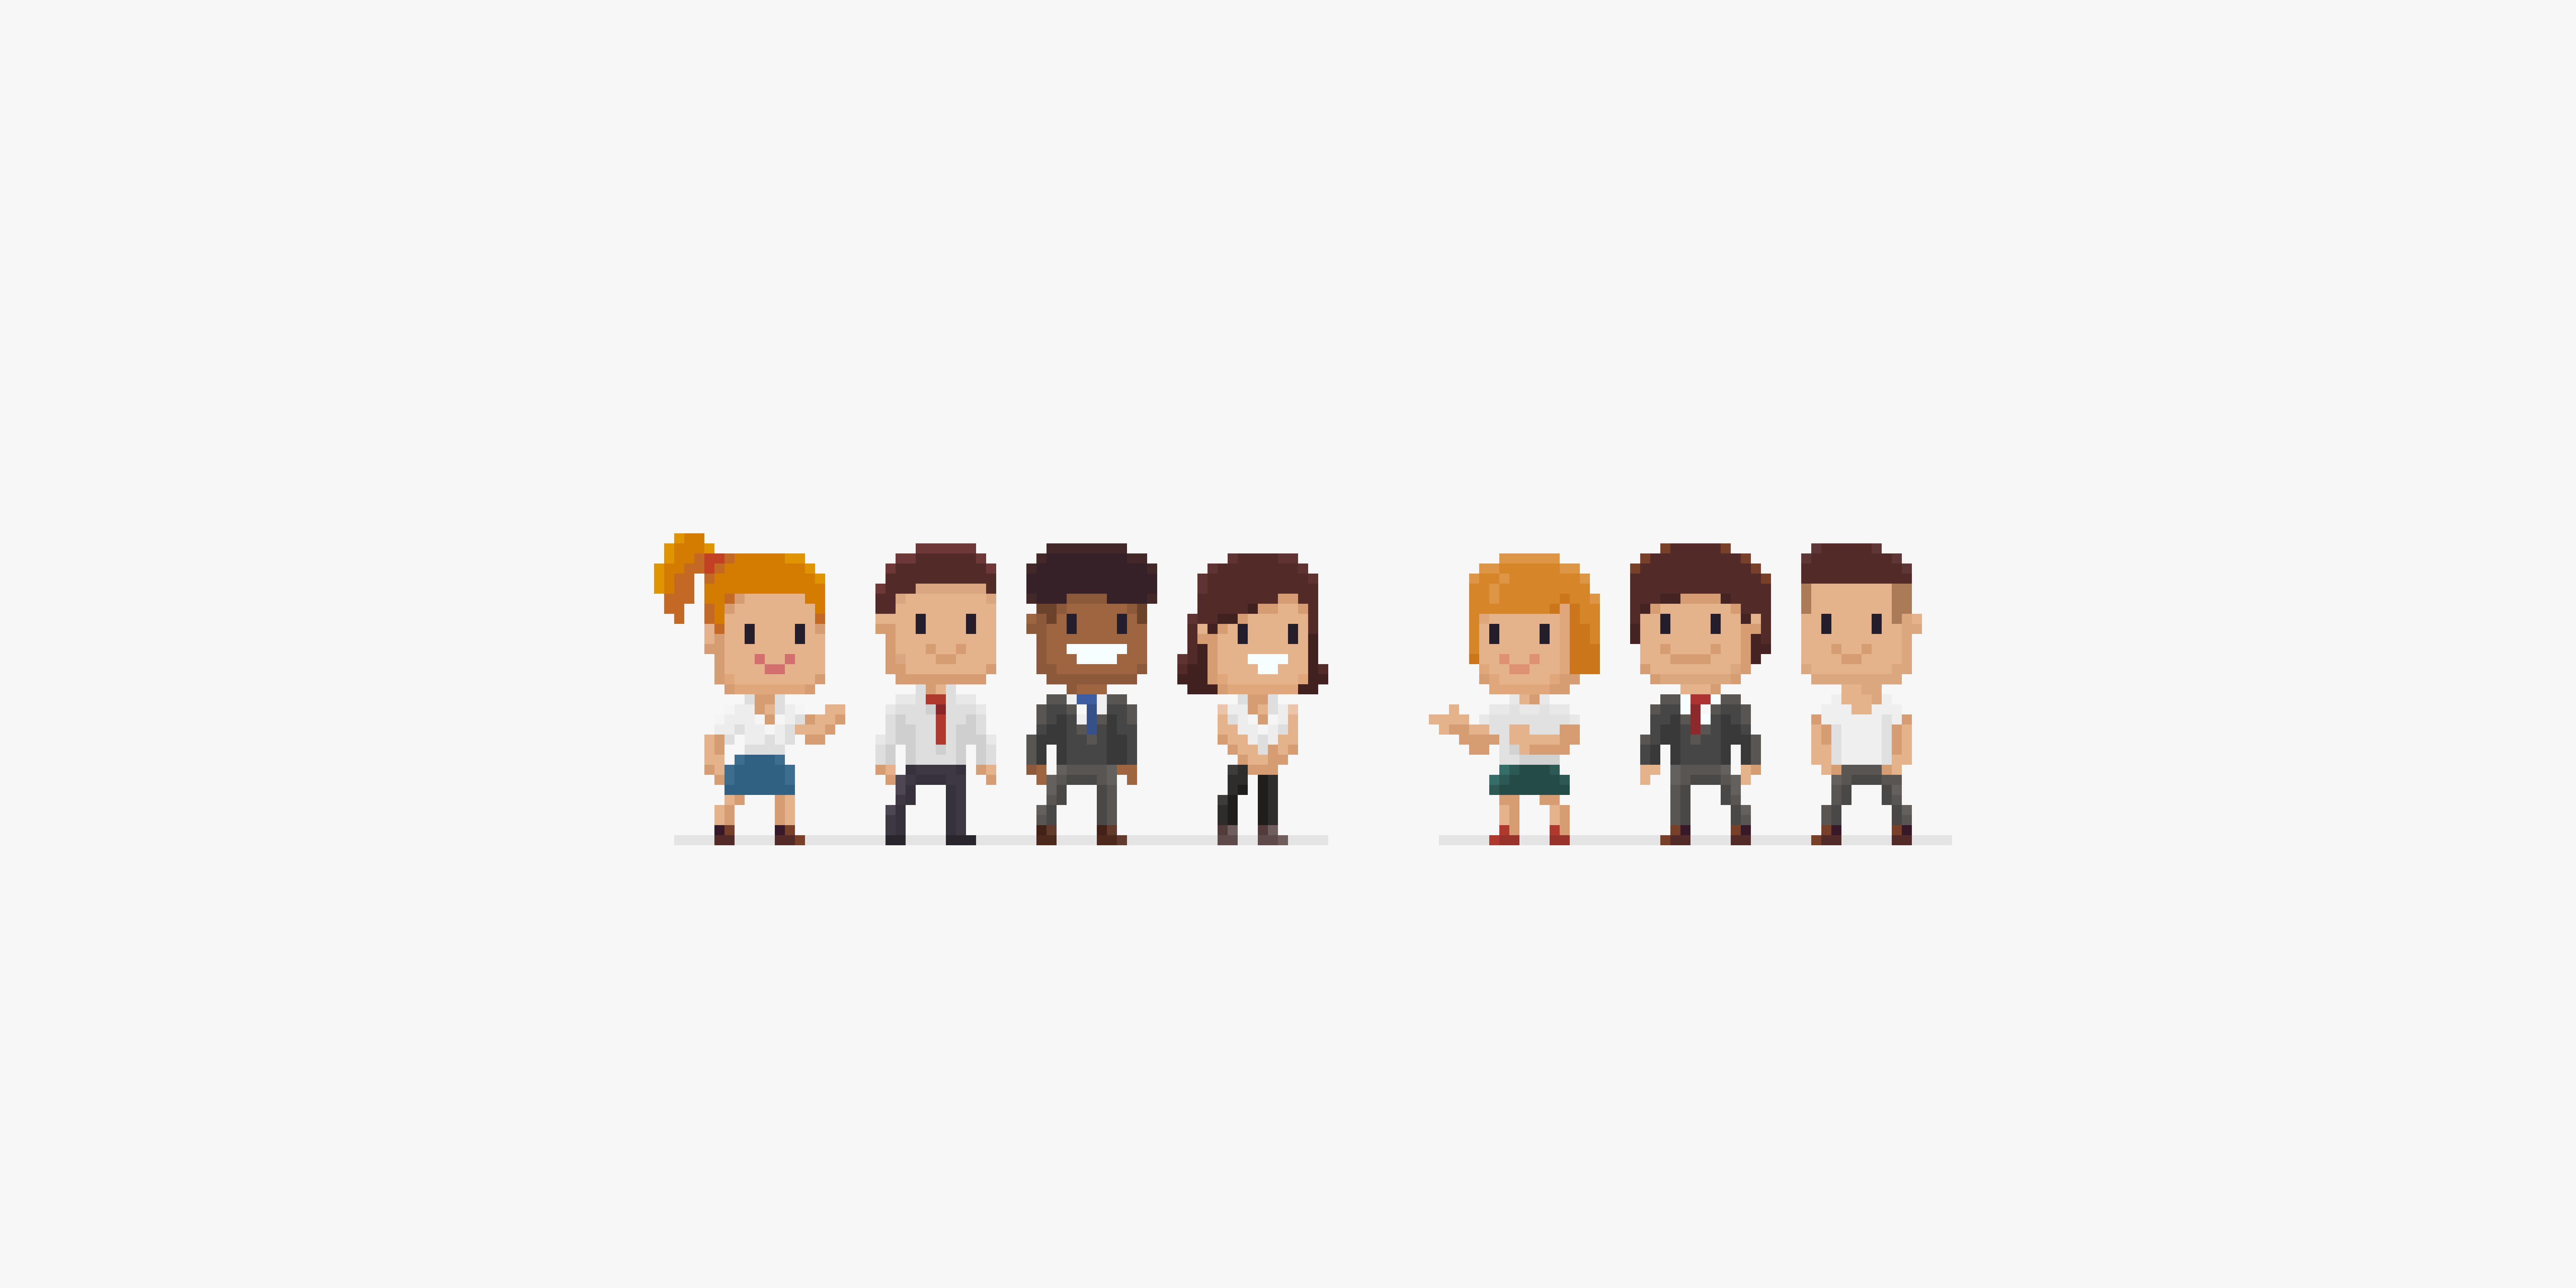 Everyone loves the nostalgic emotions pixel art evokes